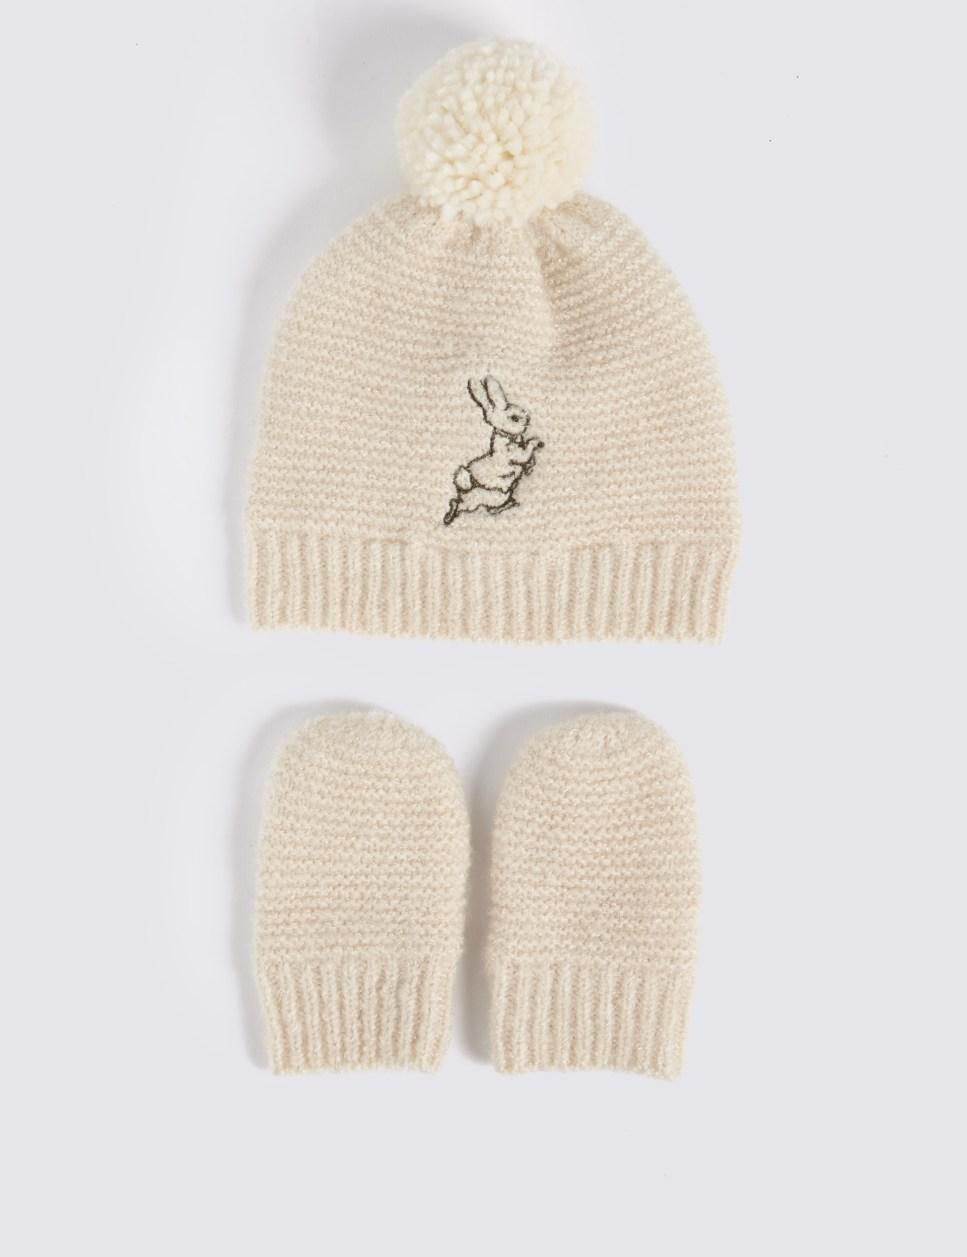 M&S Baby Peter RabbitTM Hat & Mittens Set - £12-£14